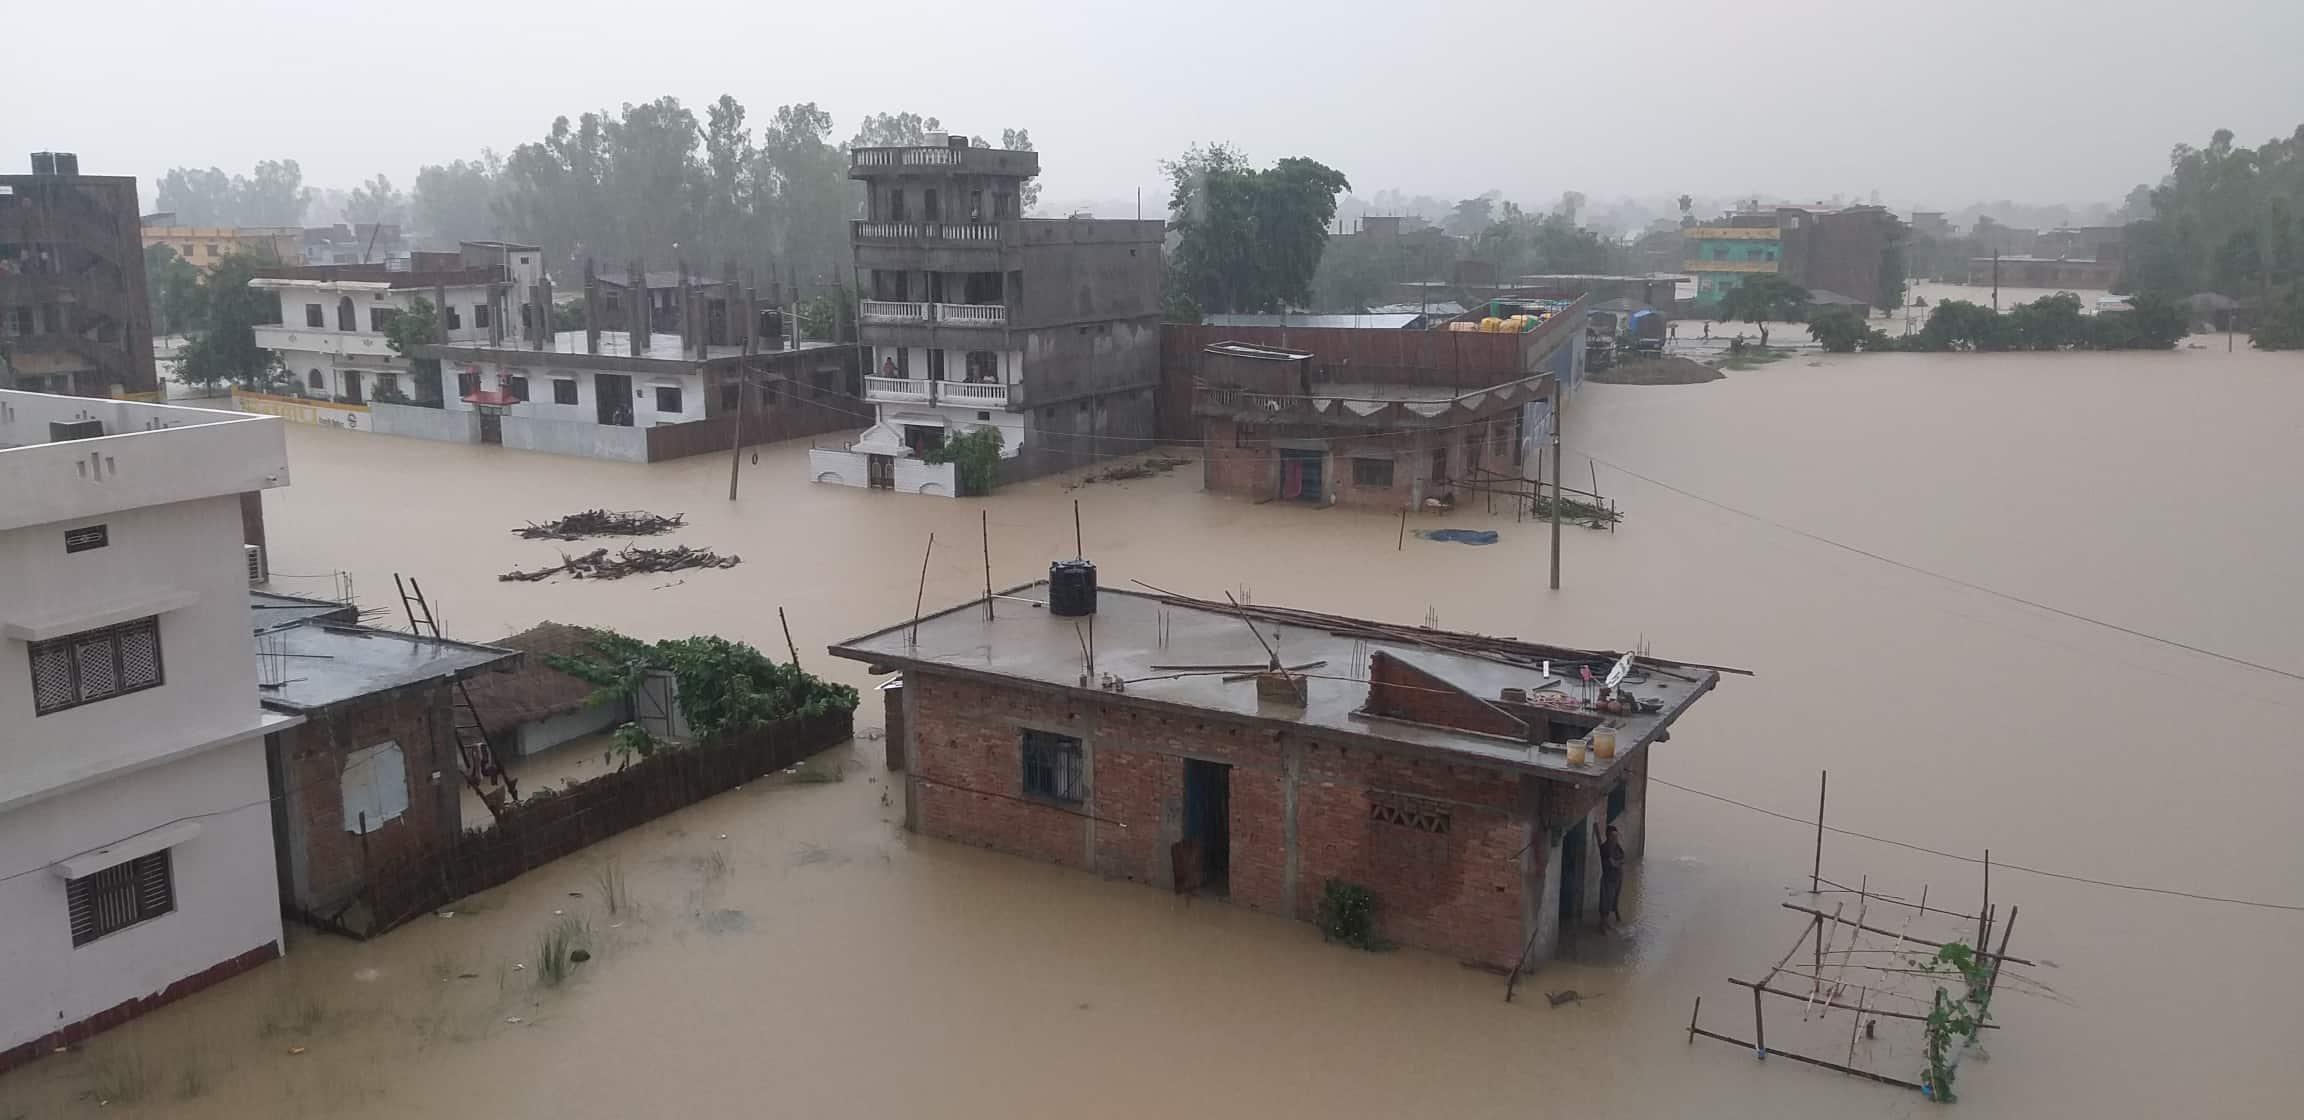 Ex-PM Nepal's home flooded amid heavy rainfalls